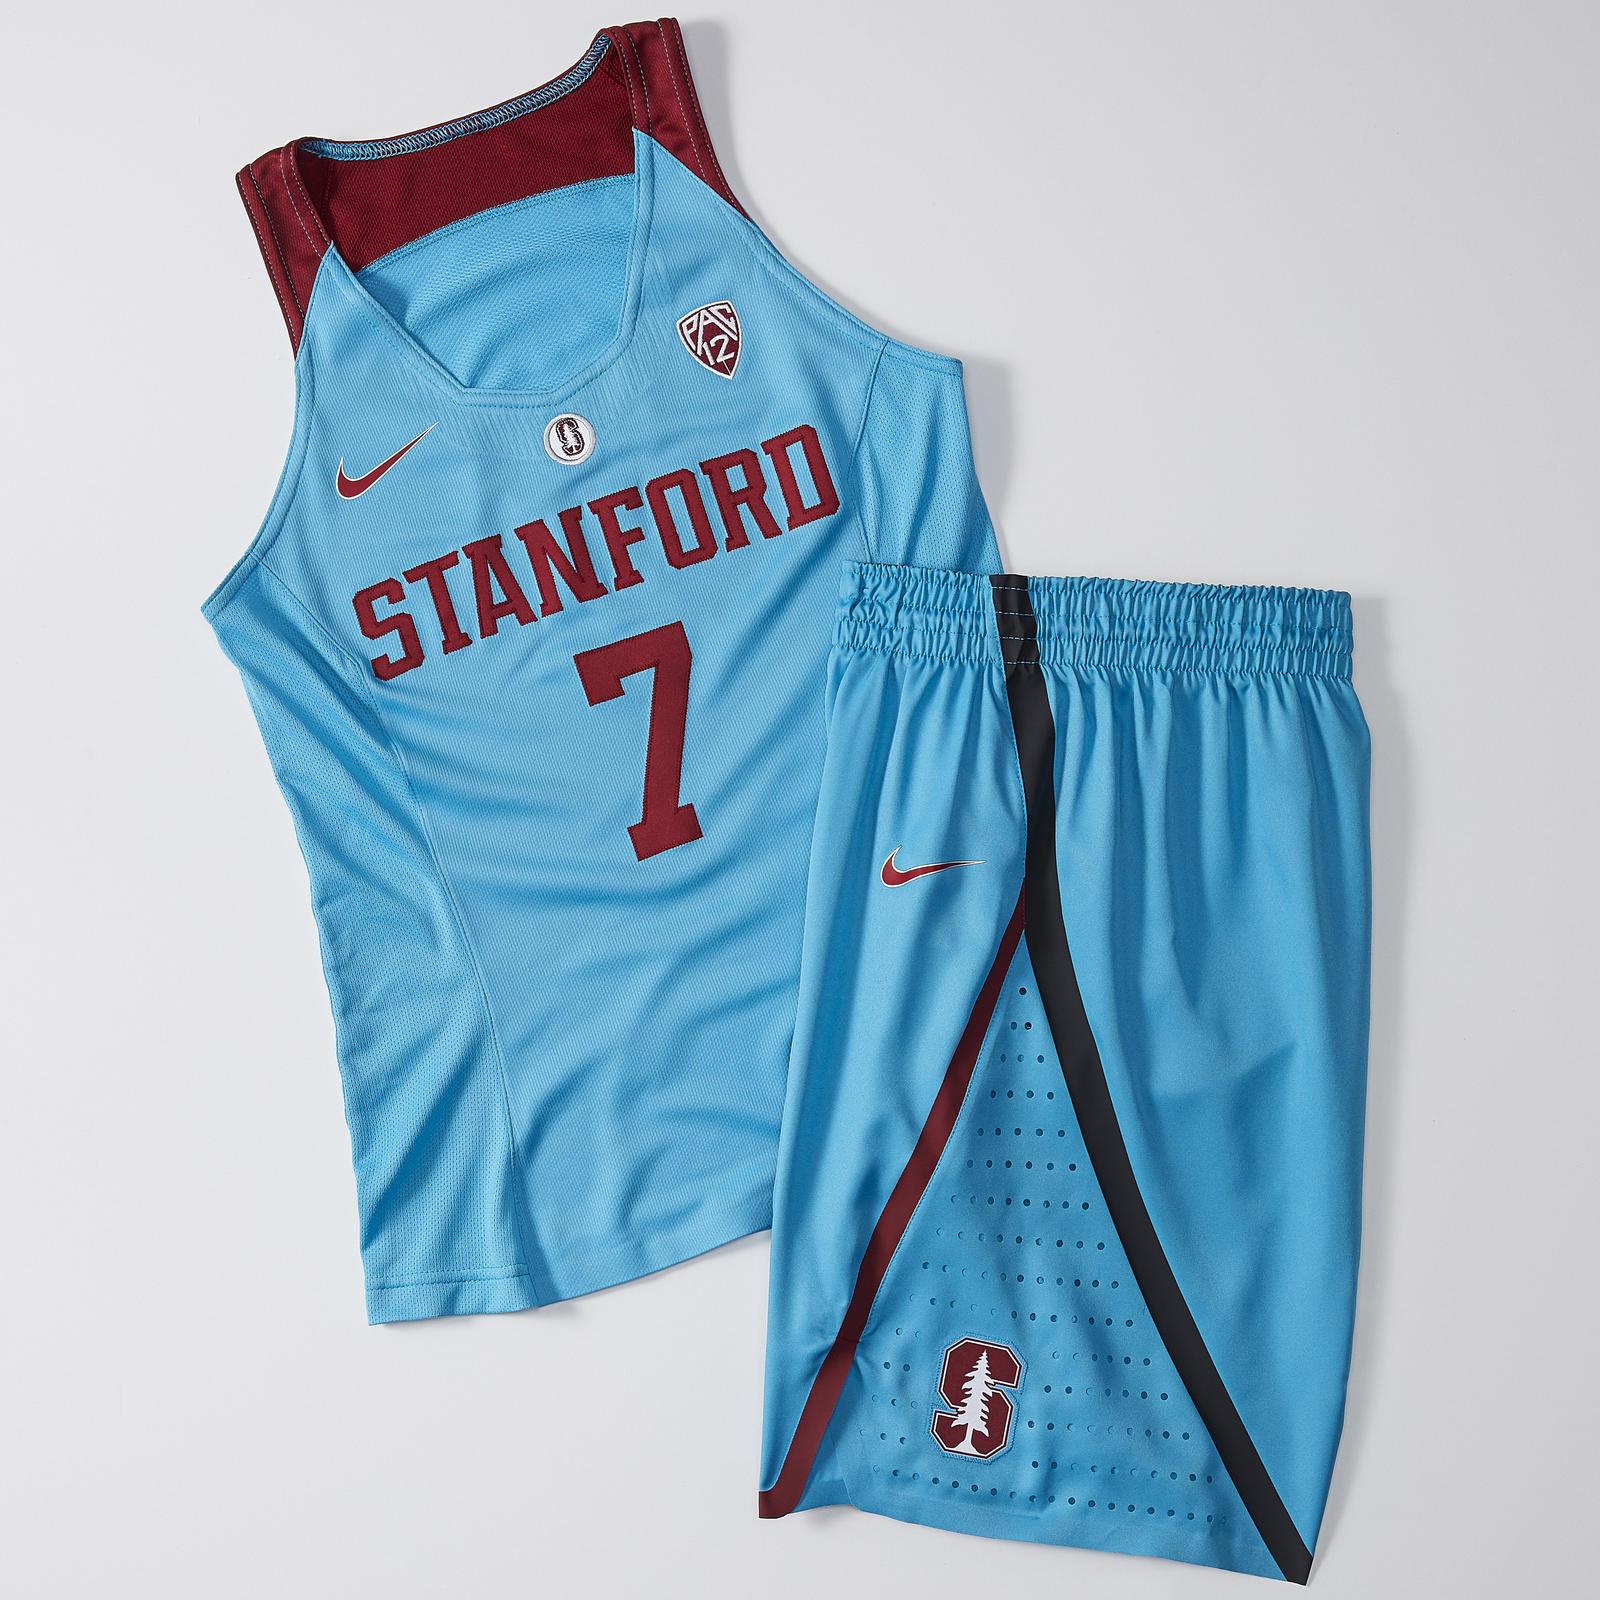 W_Stanford_square_1600.jpg